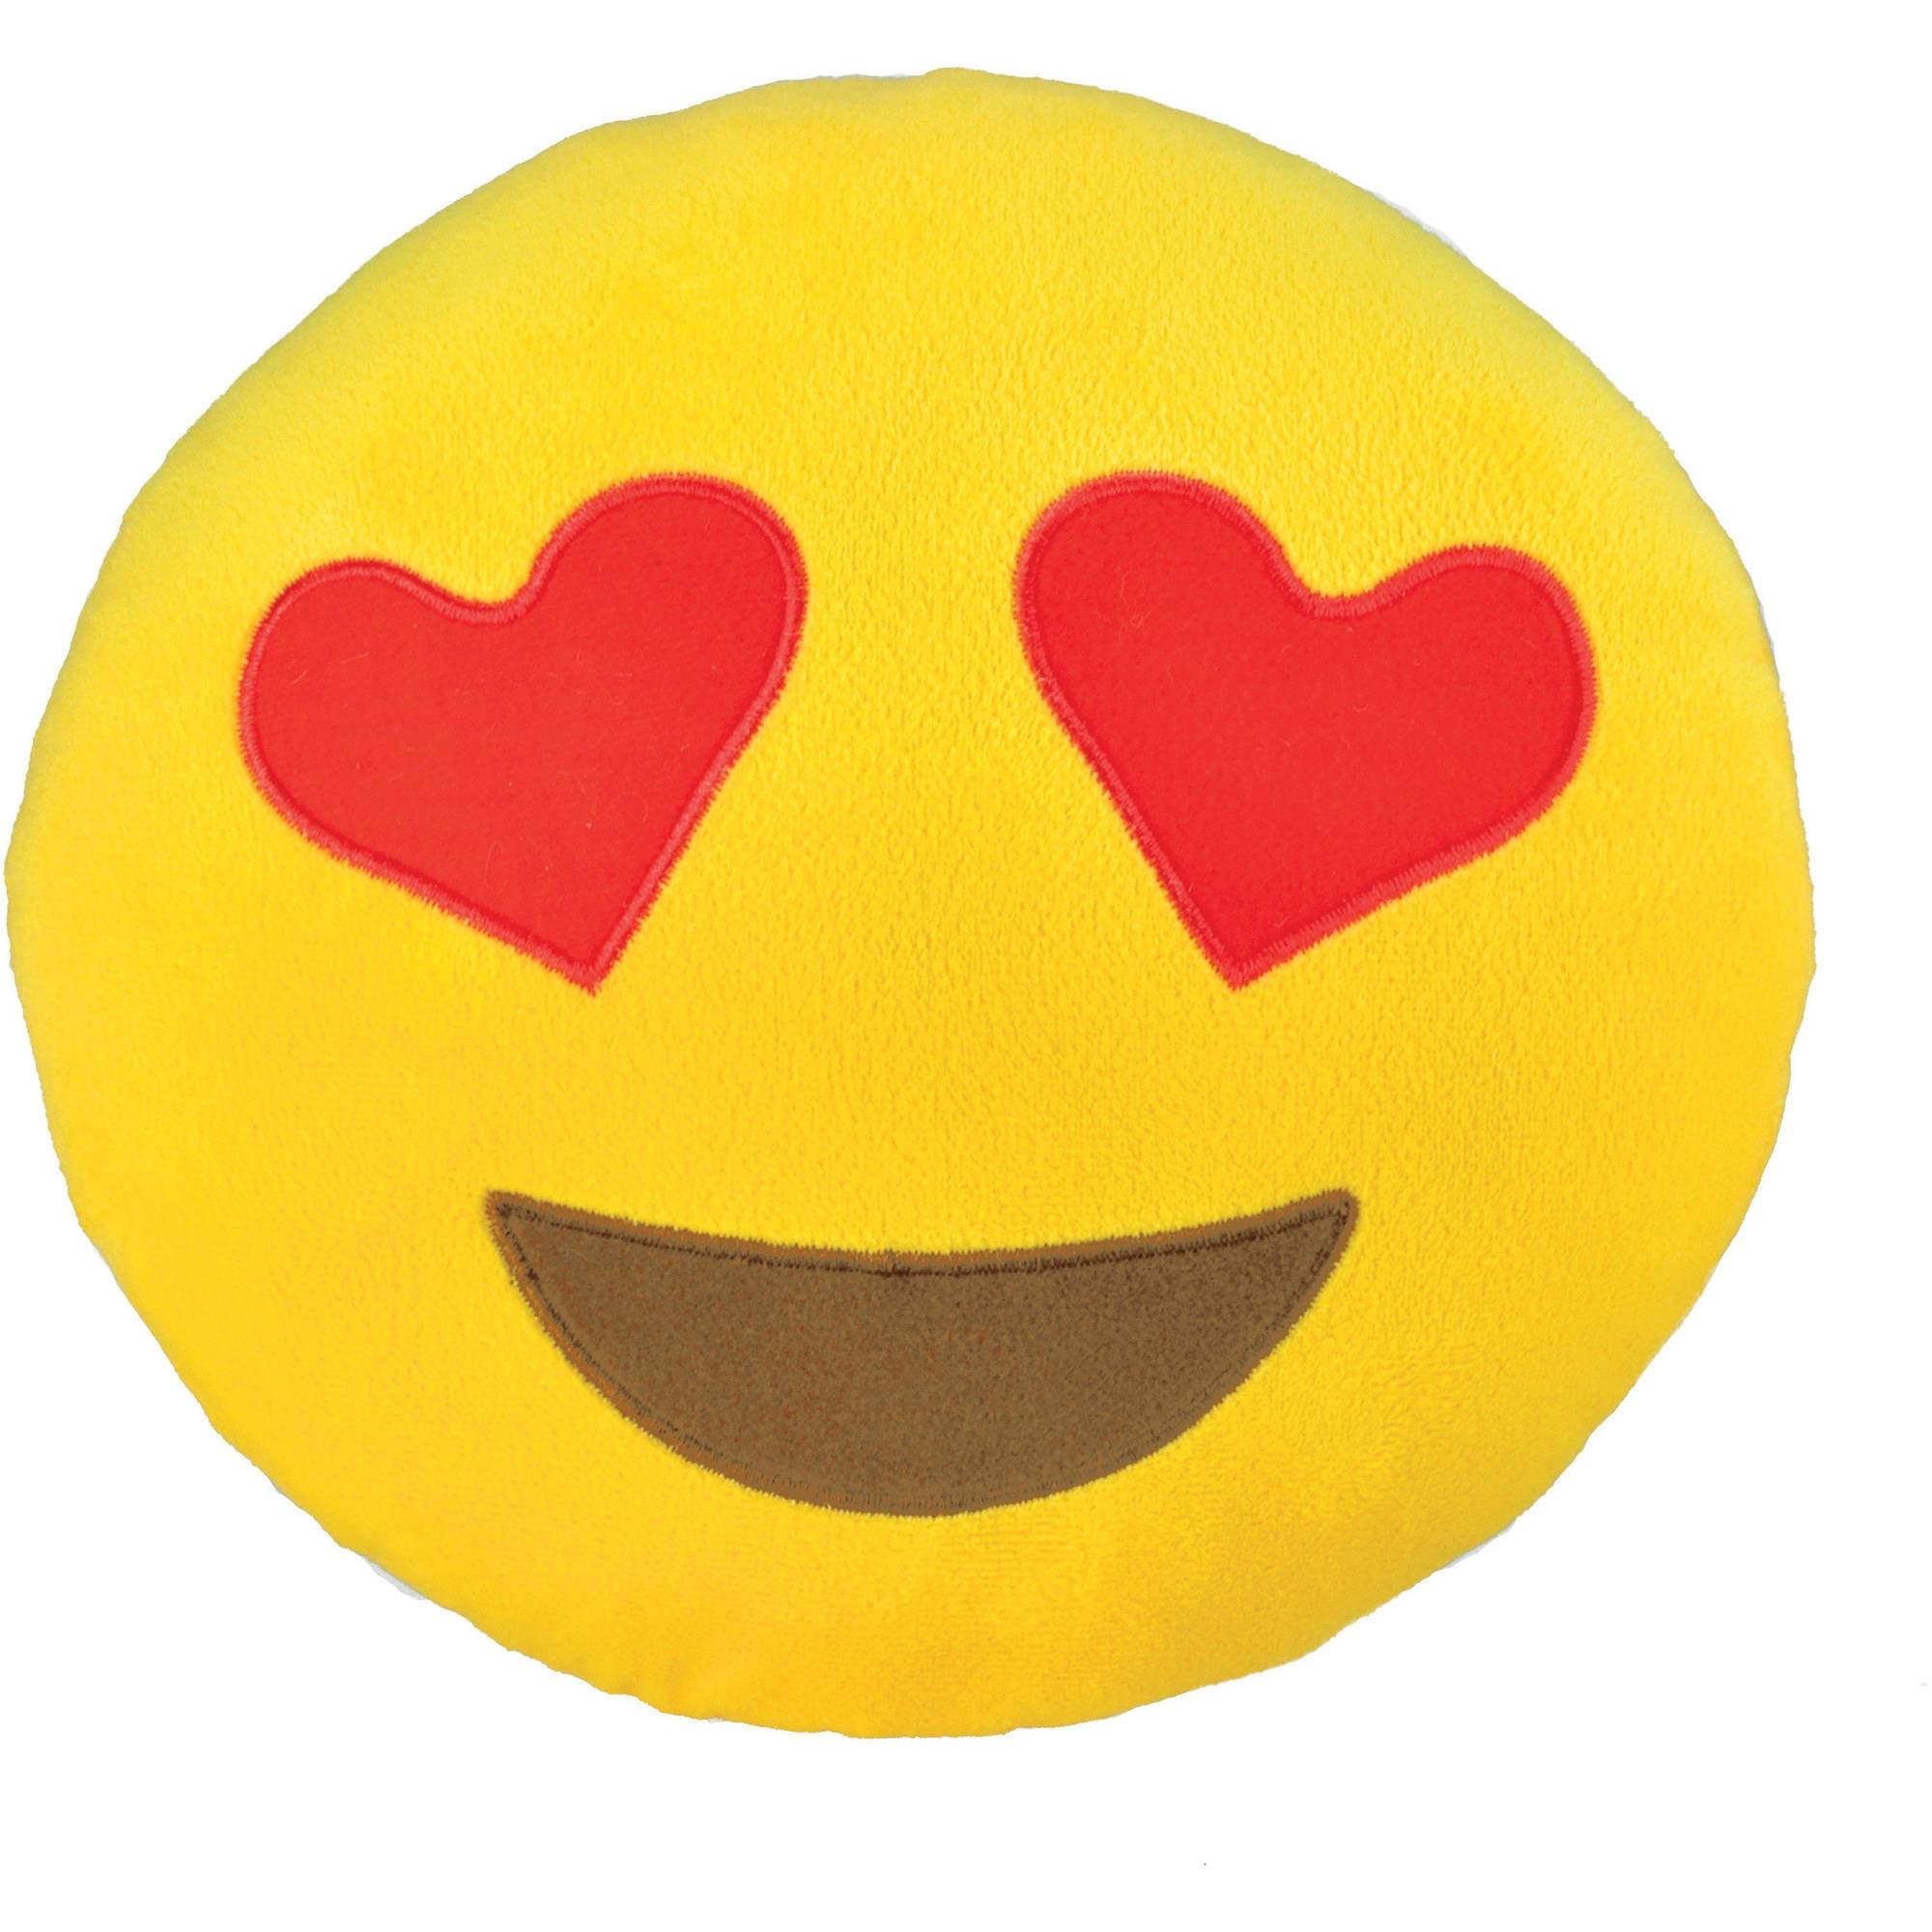 Emoji Small Pillow, Heart Eyes